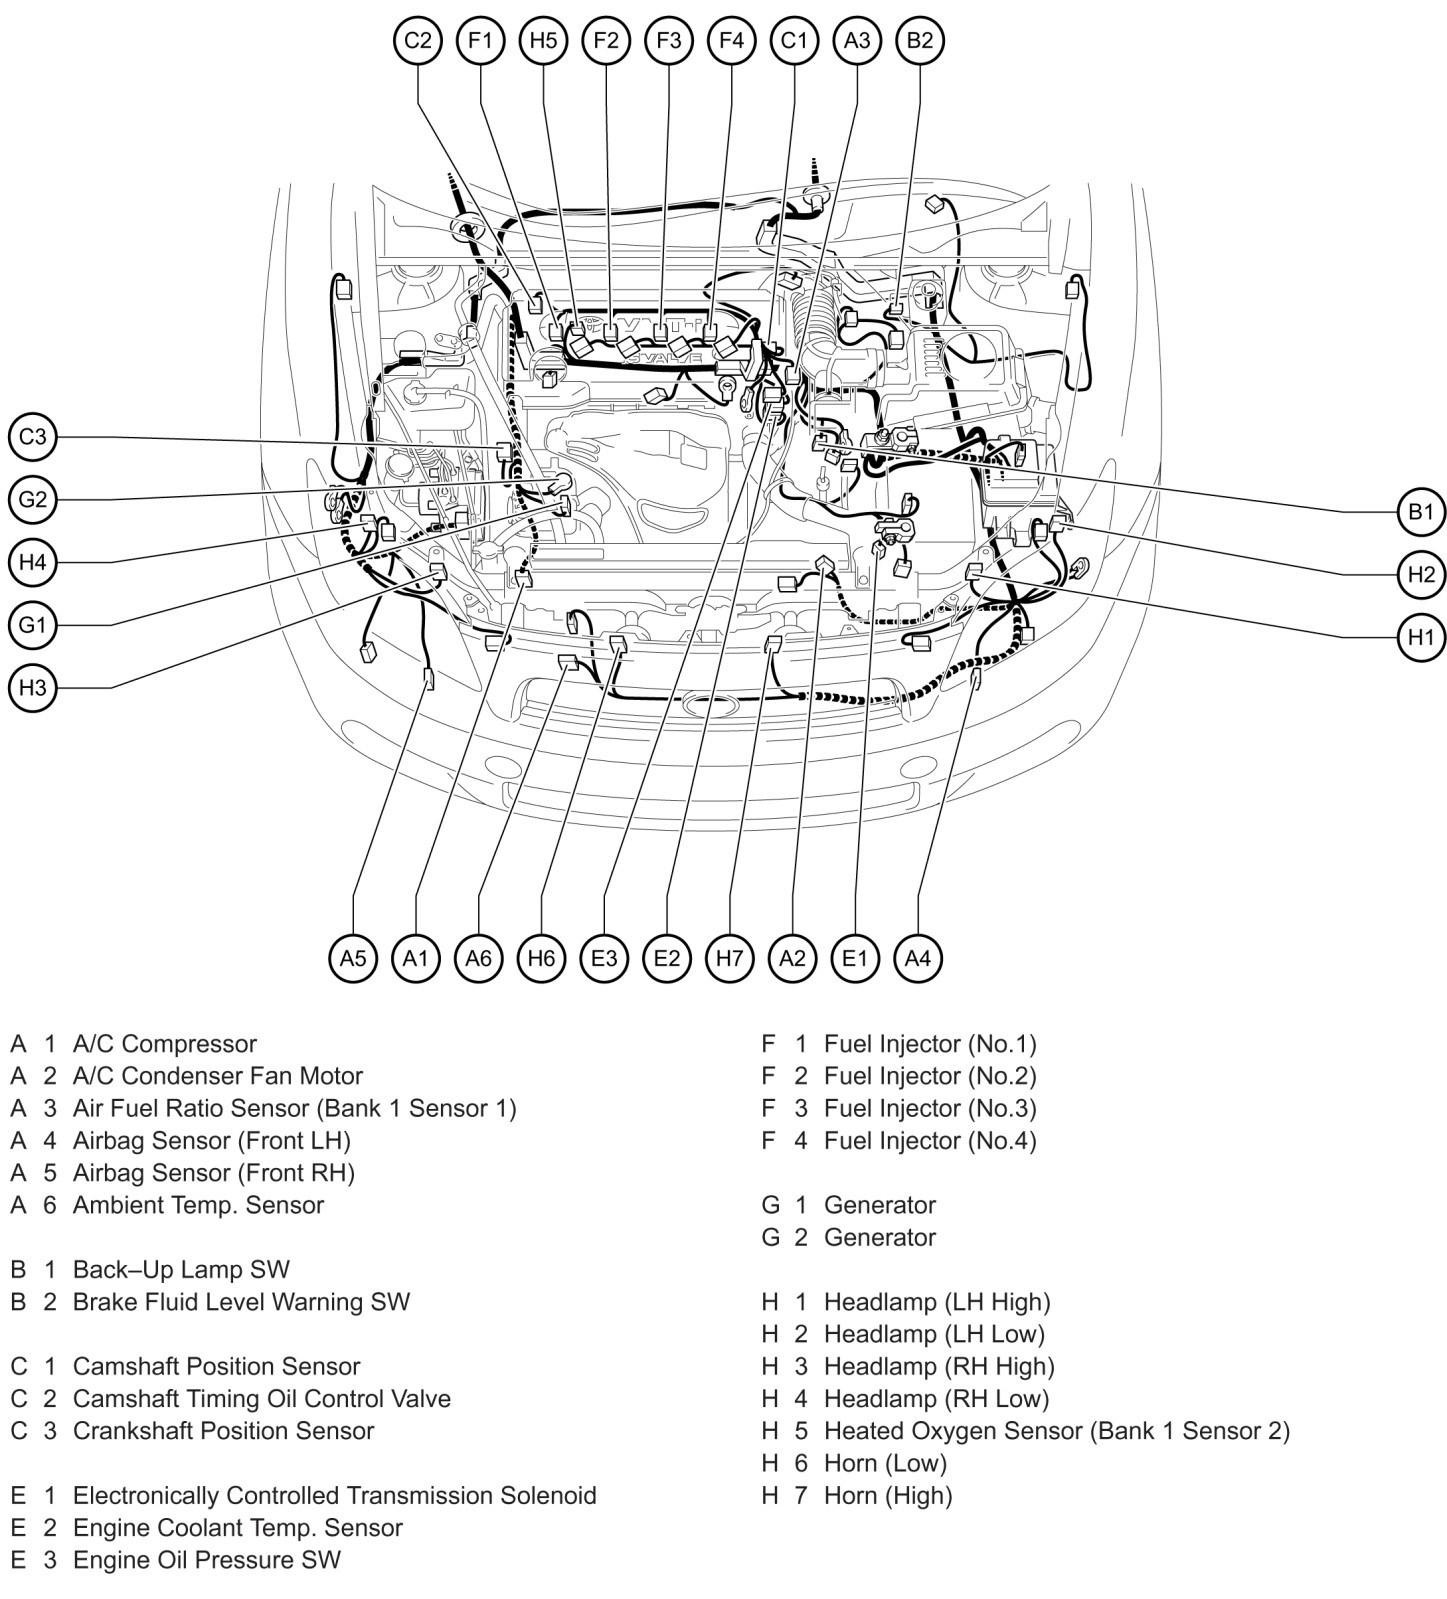 az_7298] 2008 scion xd wiring diagram schematic download diagram  unho benkeme mohammedshrine librar wiring 101